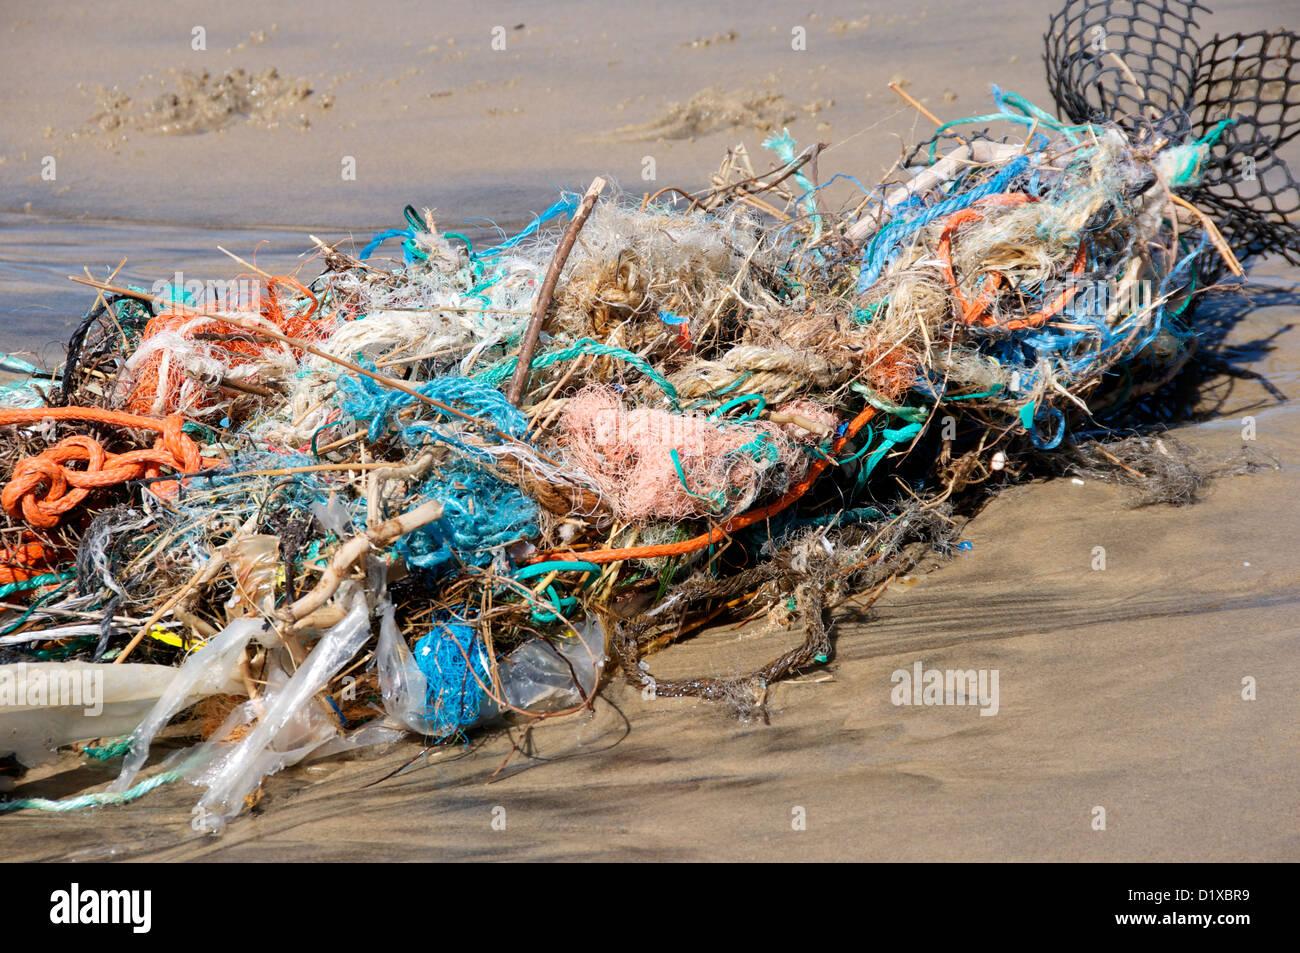 Flotsam washed up on a french beach - Stock Image